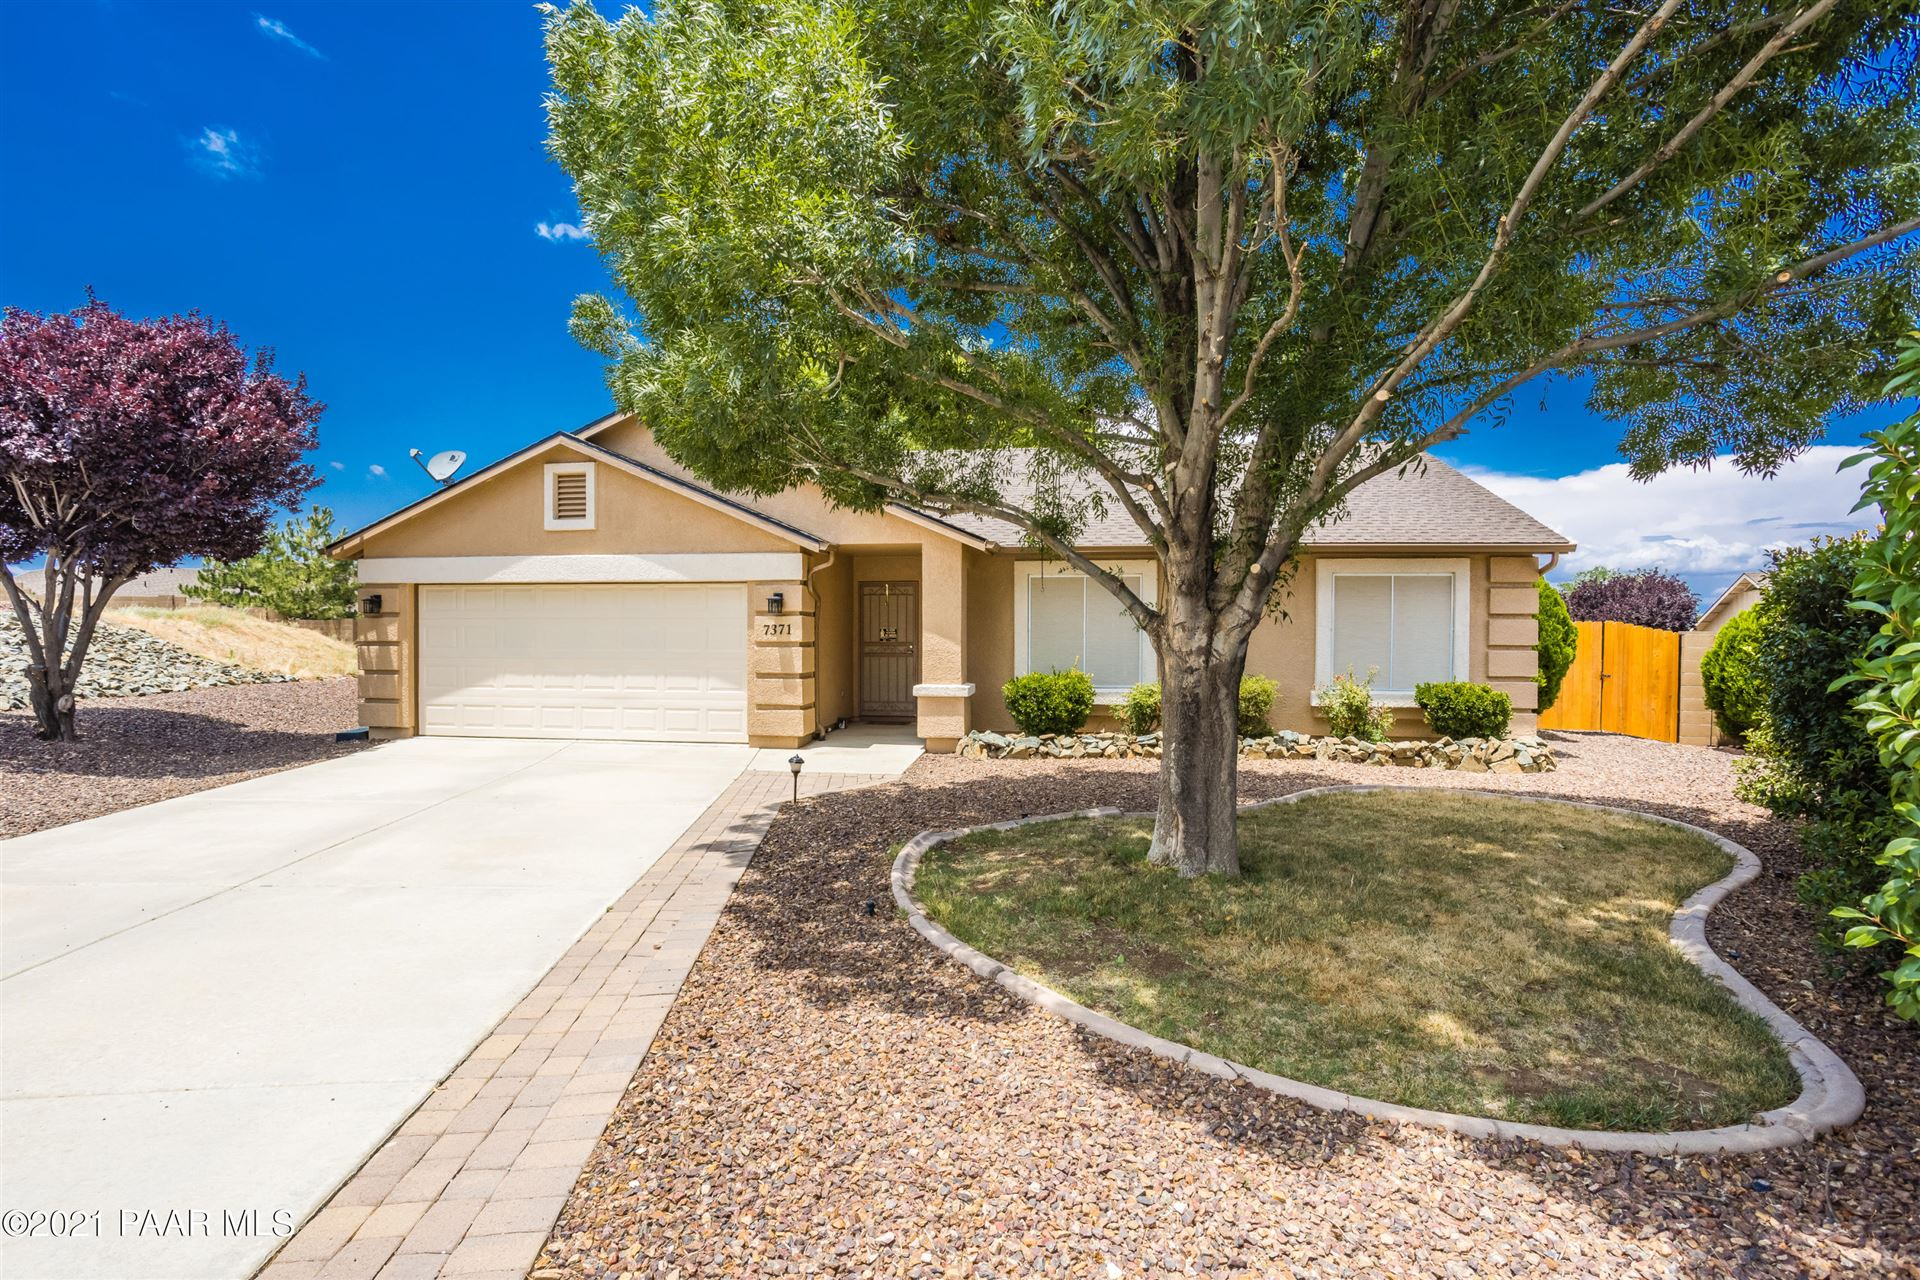 Photo of 7371 N Summit Place, Prescott Valley, AZ 86315 (MLS # 1040428)